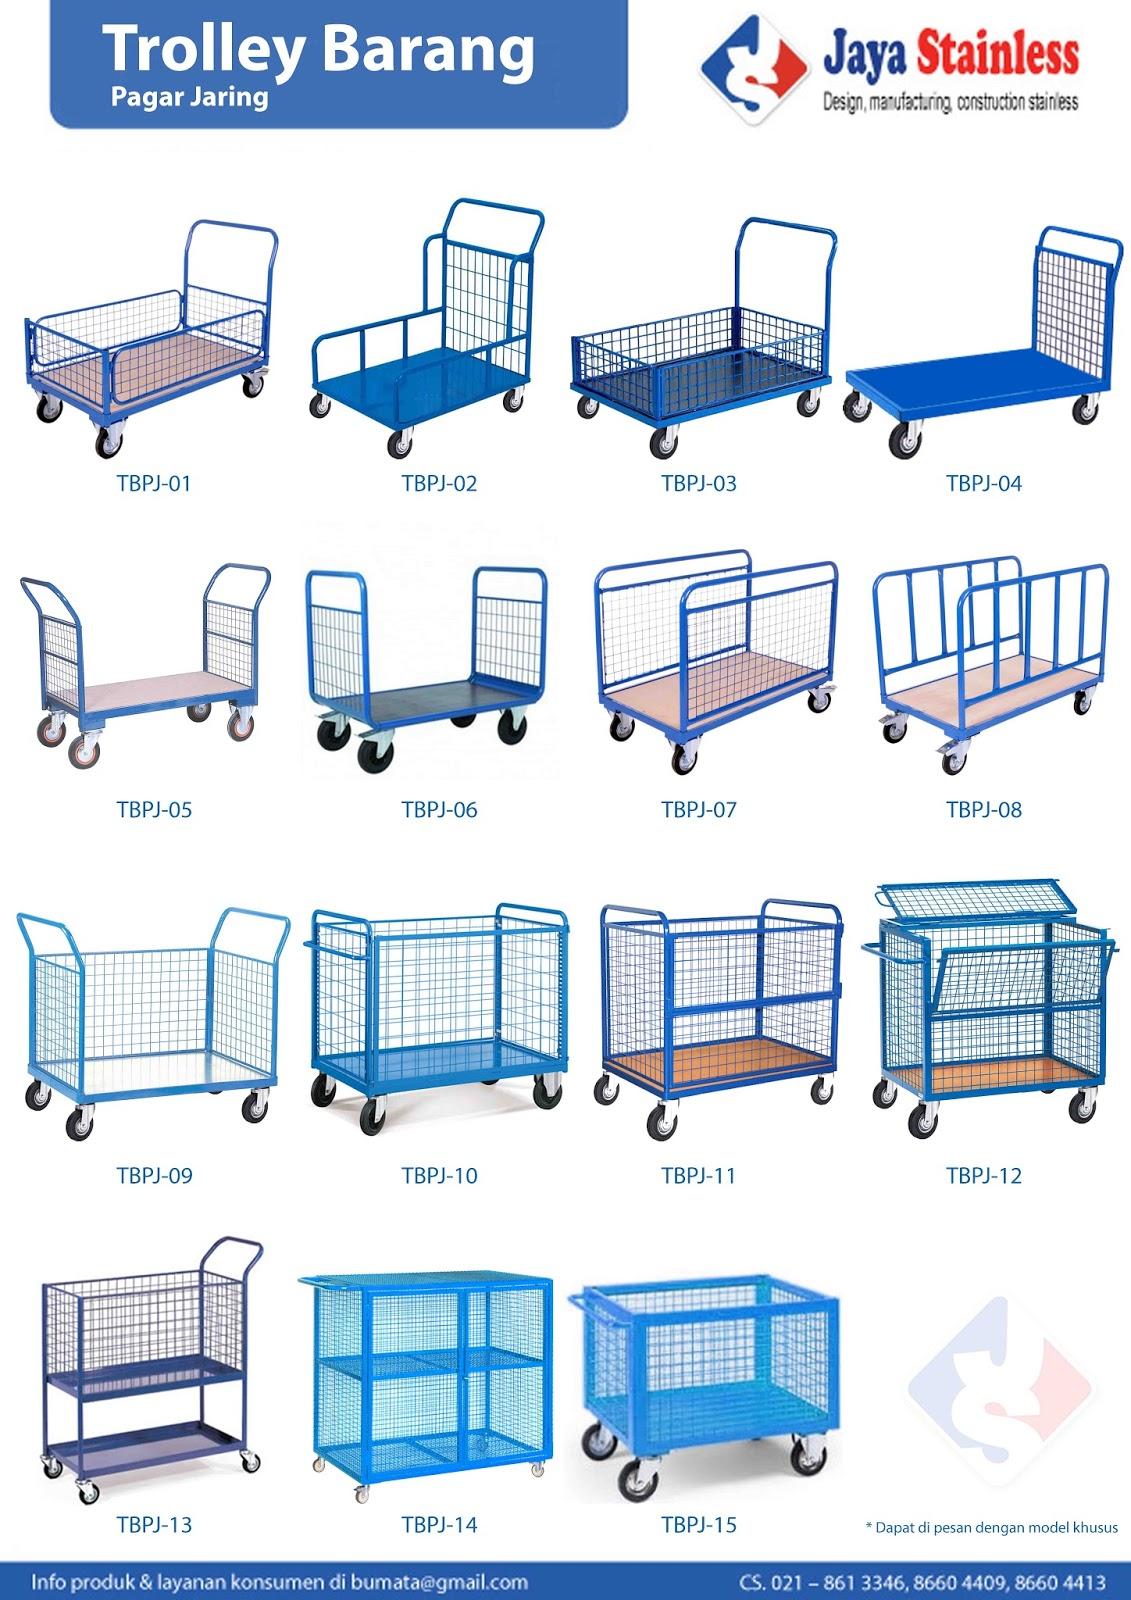 Katalog trolley barang pagar besi